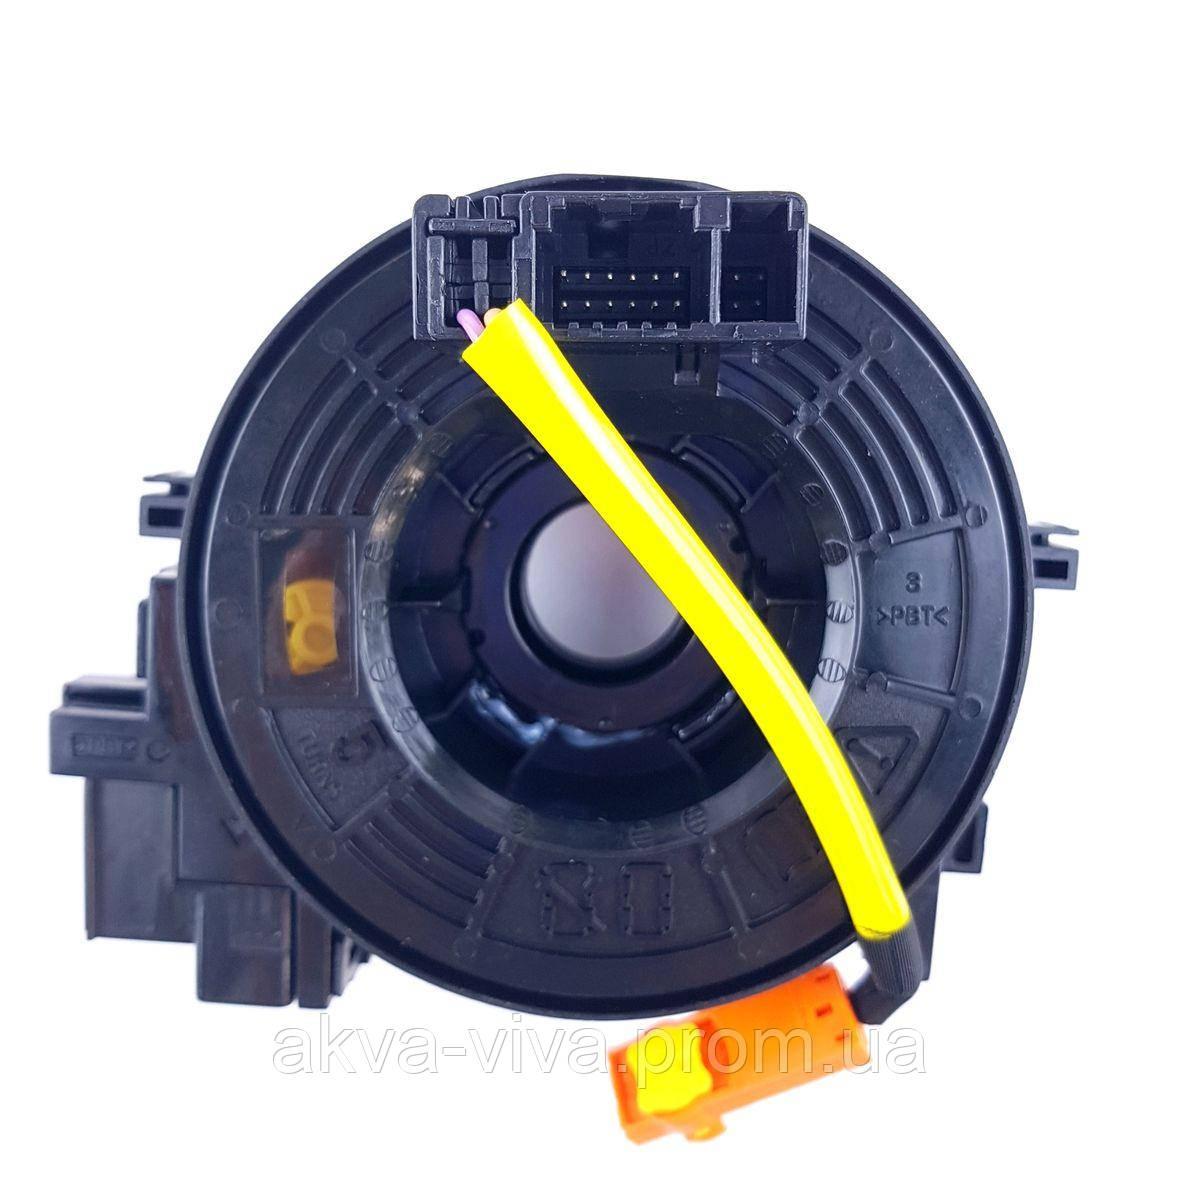 Шлейф руля (рулевая улитка) на Toyota Corolla, Altis№84306-02130, 84306-06180